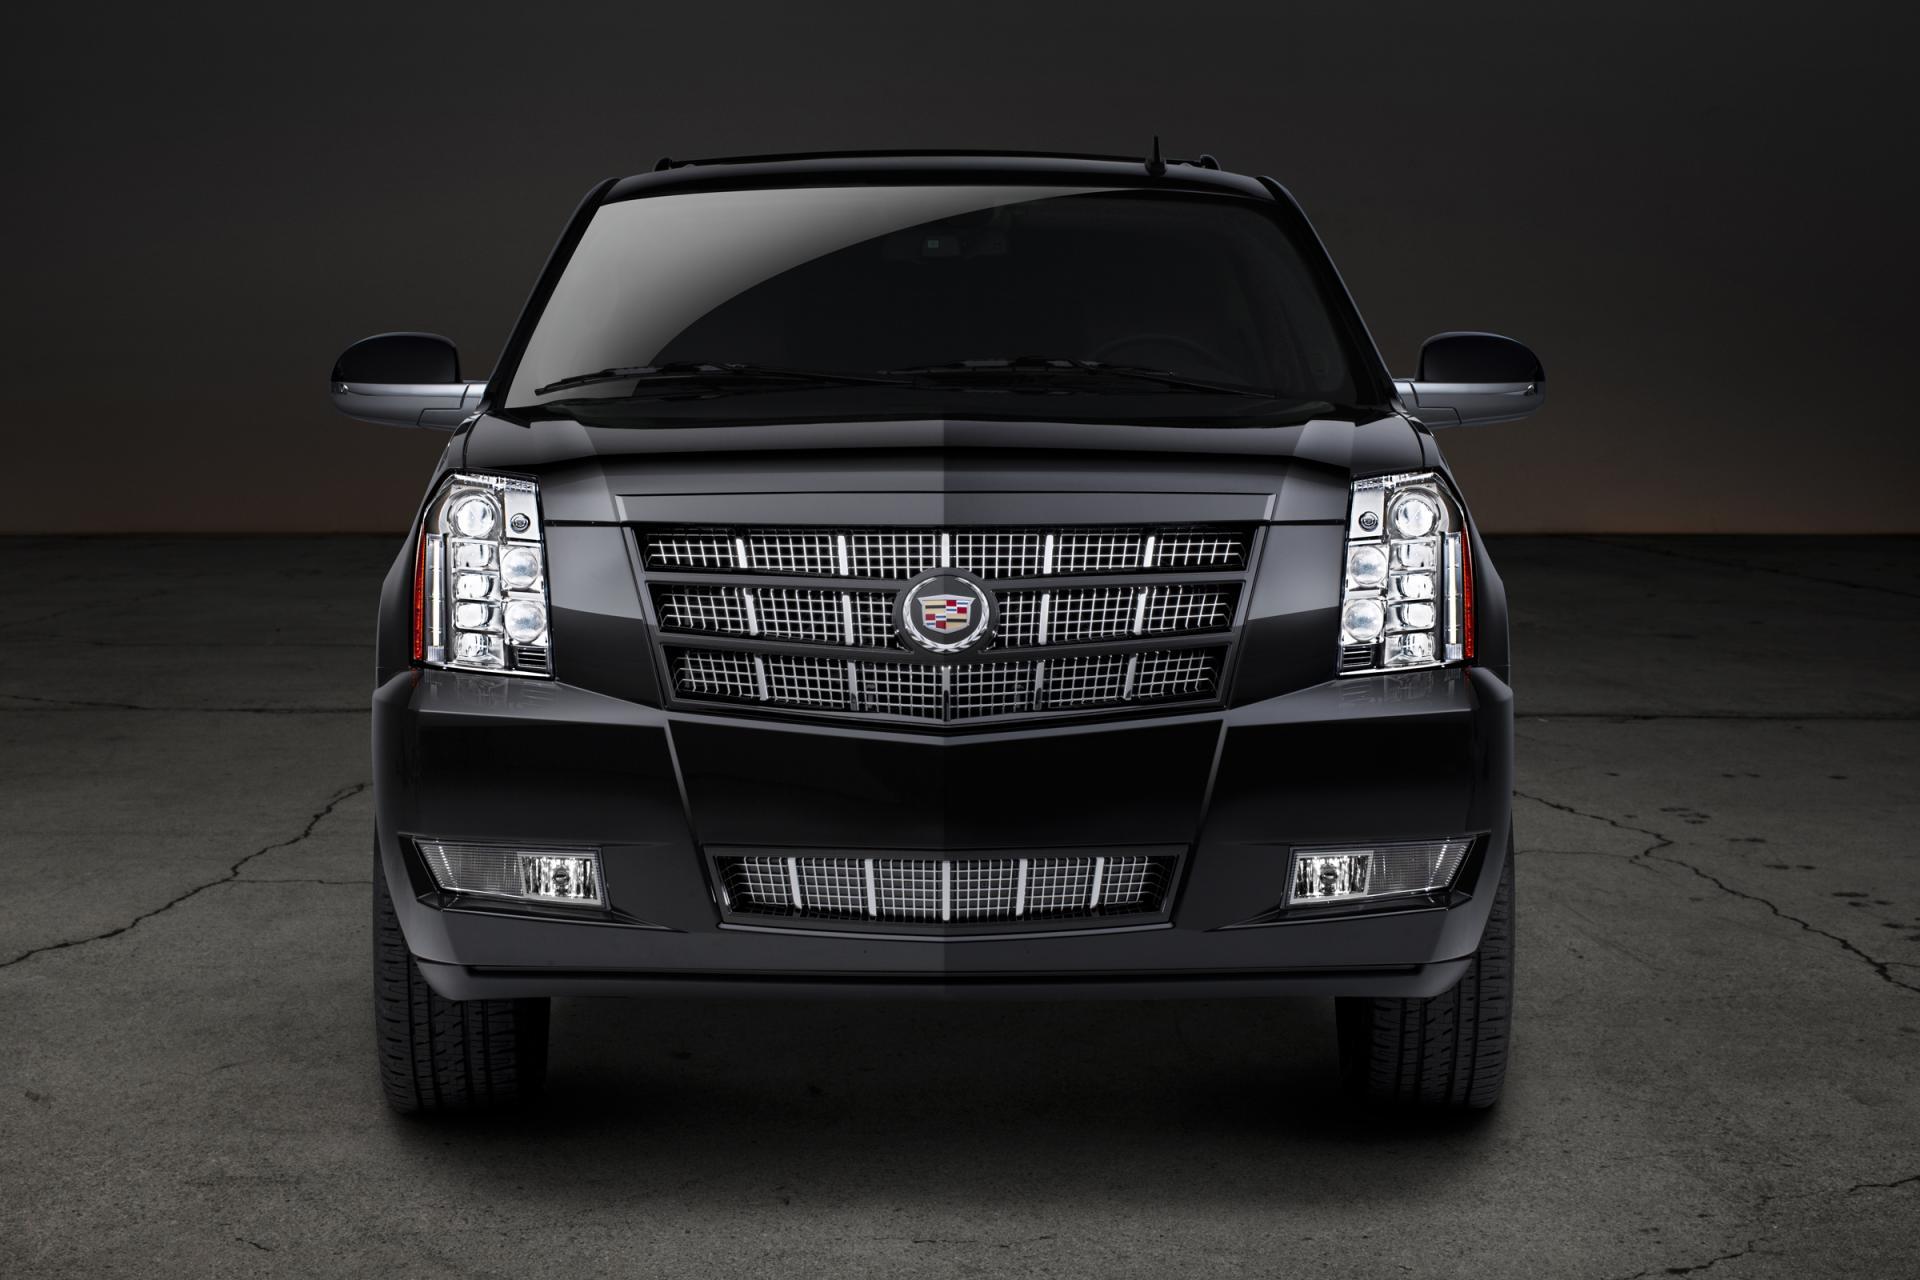 2012-Cadillac-Escalade-Hybrid-SUV_image-001.jpg